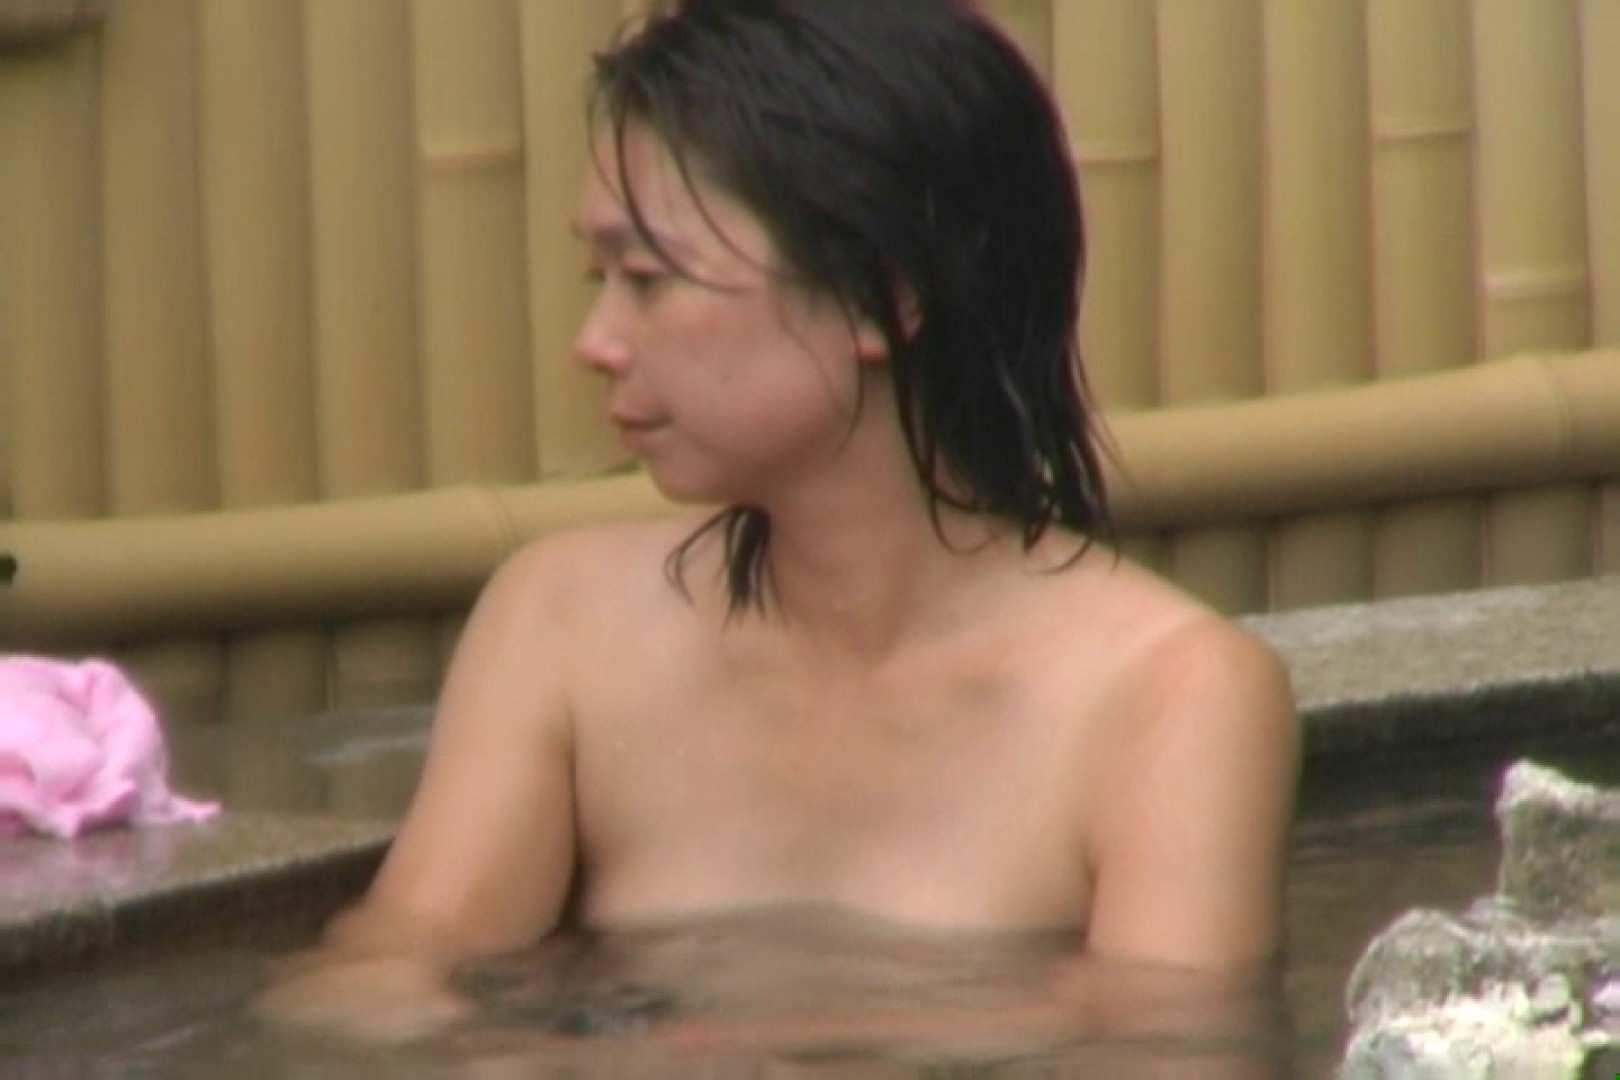 Aquaな露天風呂Vol.619 HなOL オマンコ動画キャプチャ 107pic 87